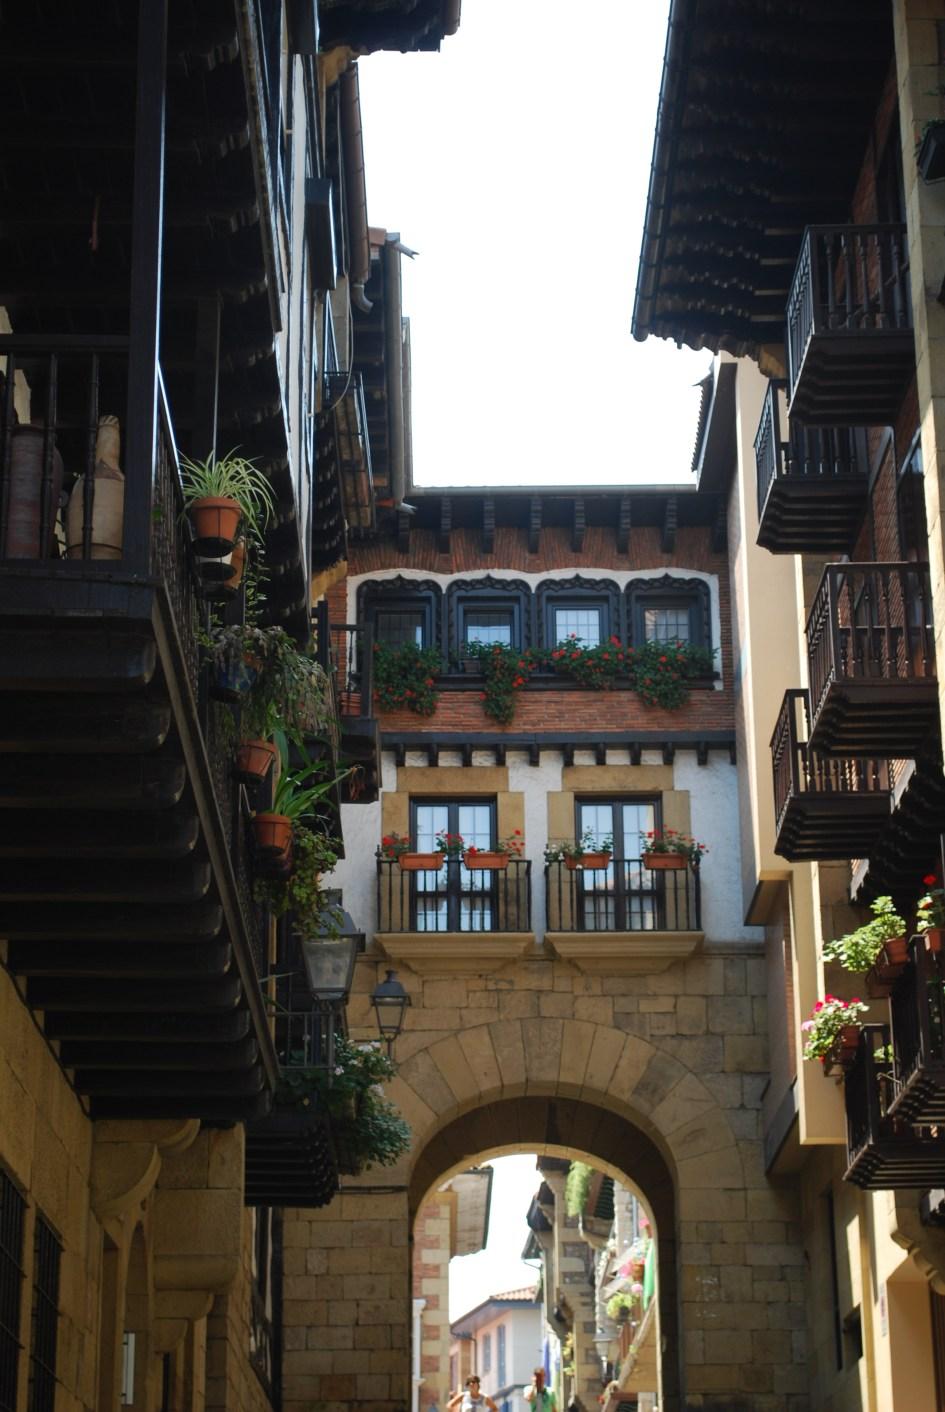 Entrada al Casco Histórico de Hondarribia